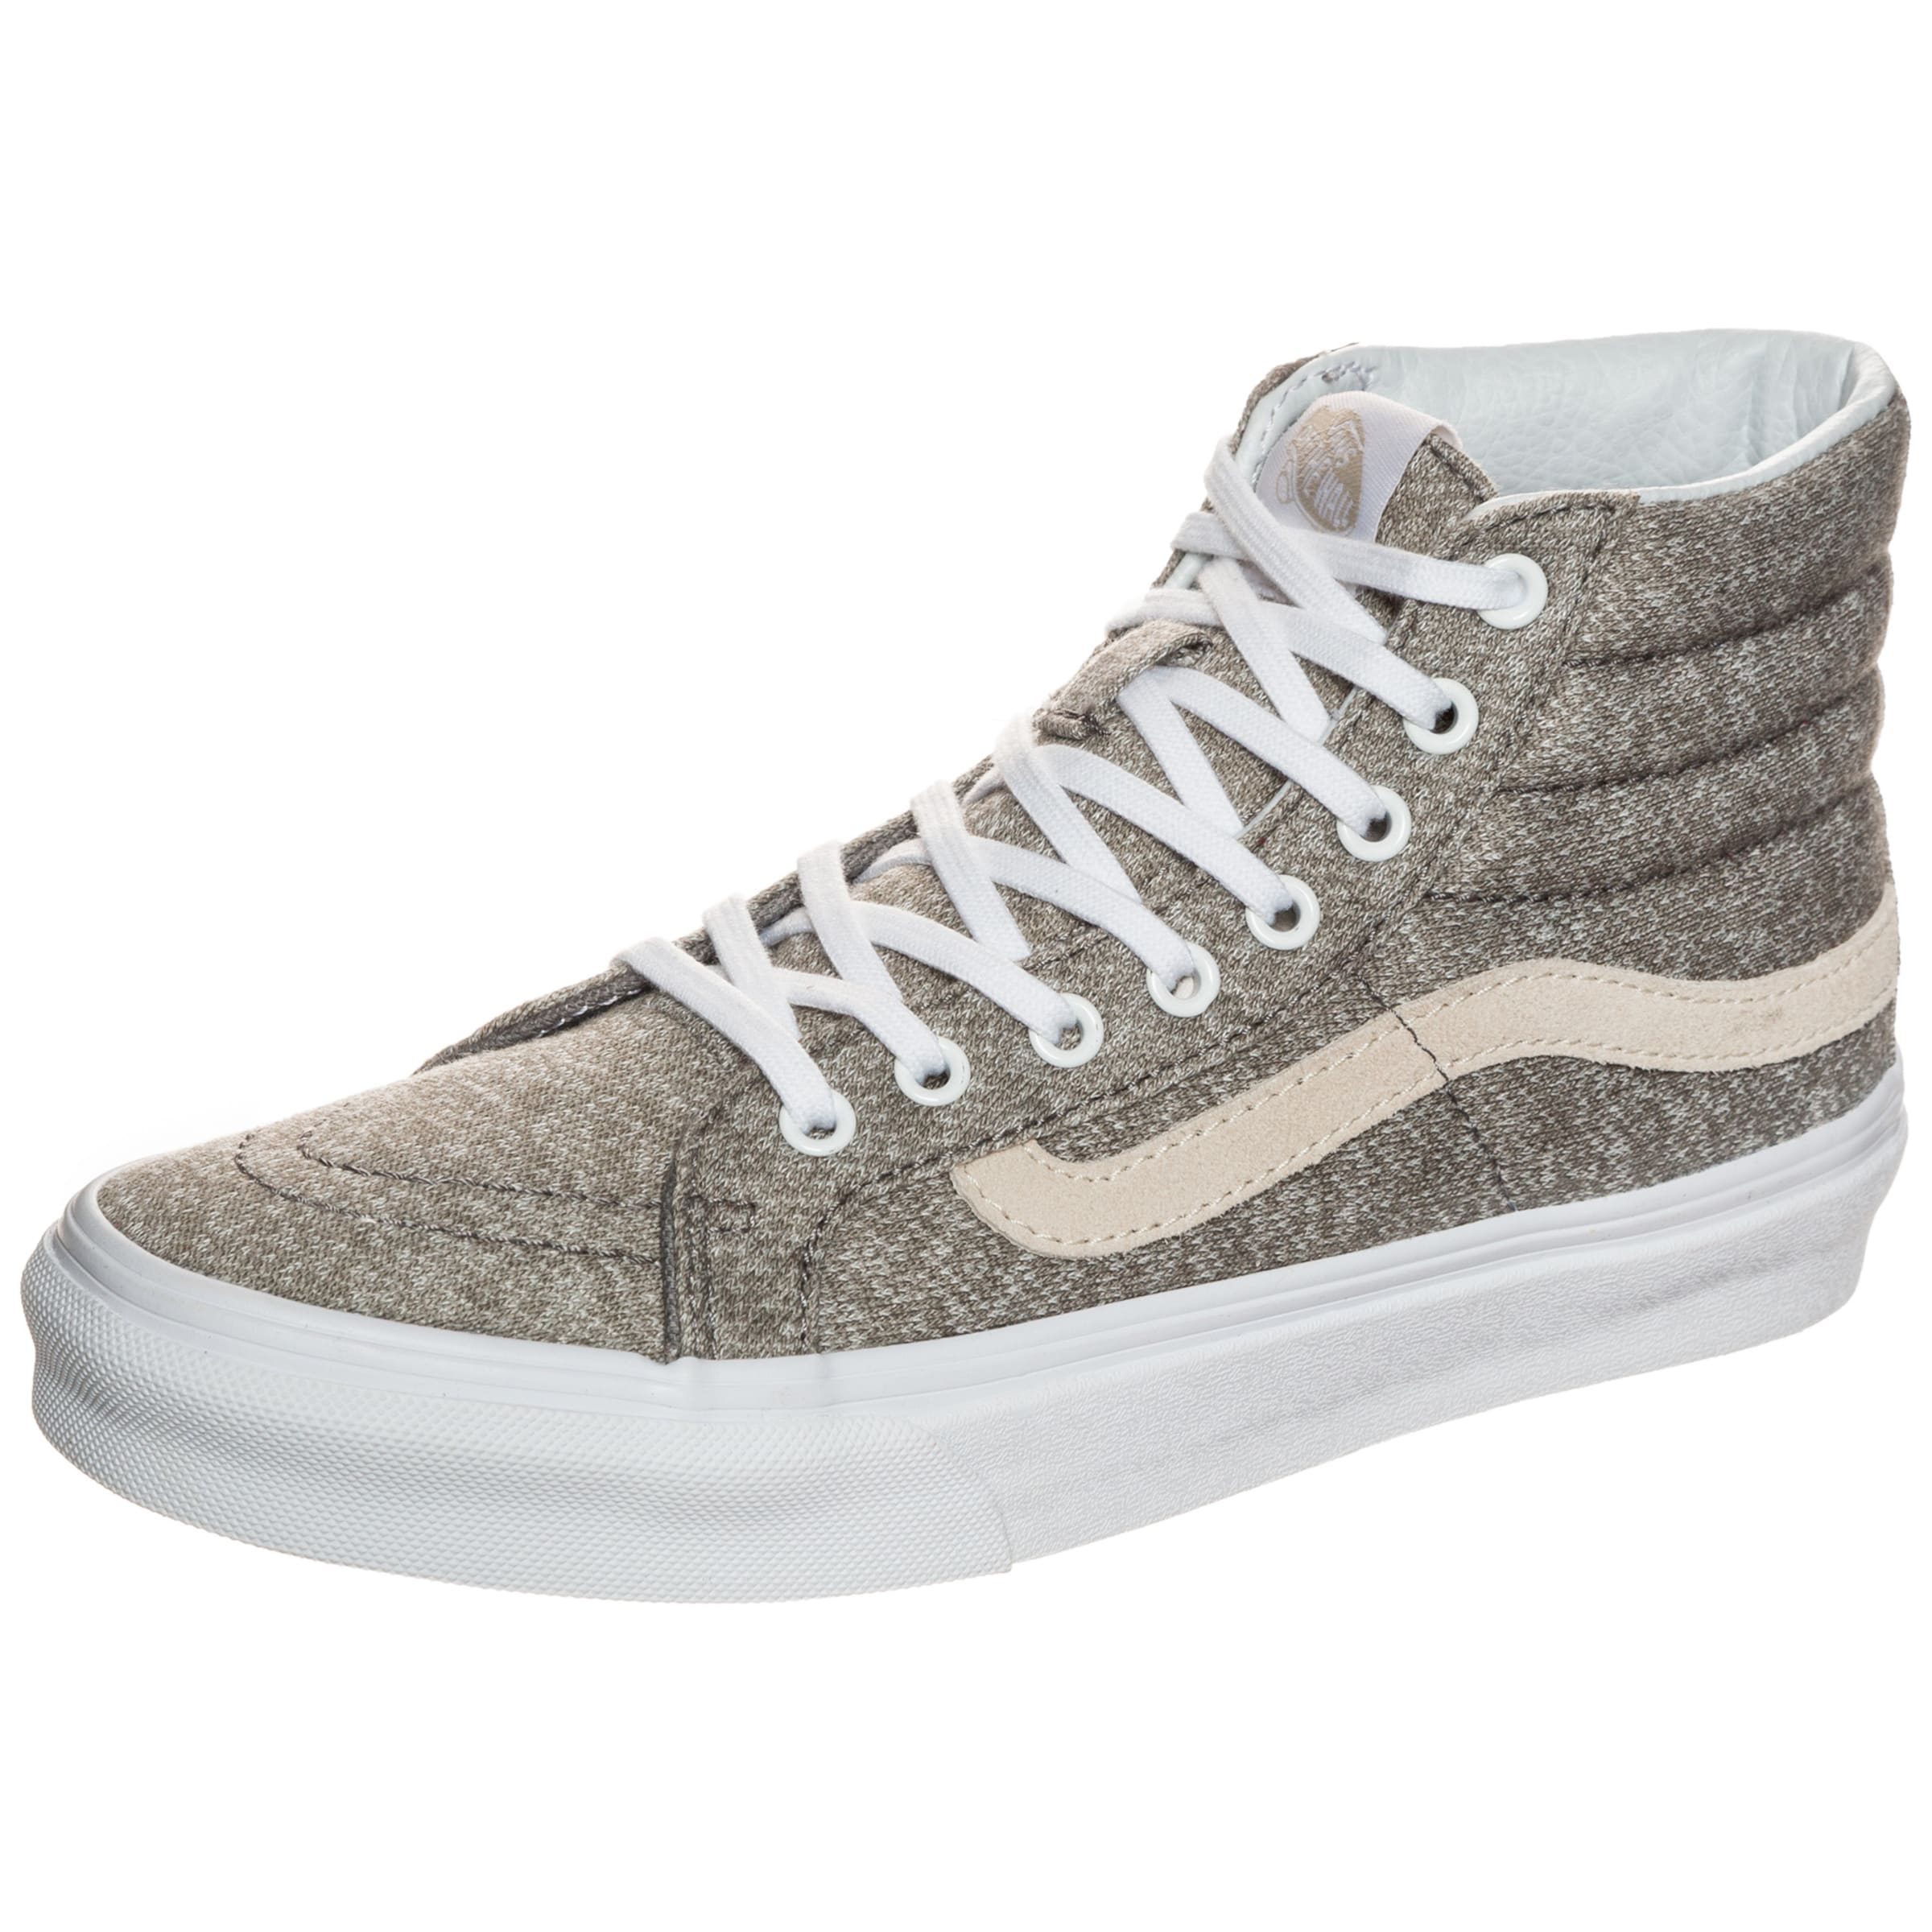 VANS Sk8-Hi Slim Sneaker Damen Hohe Qualität